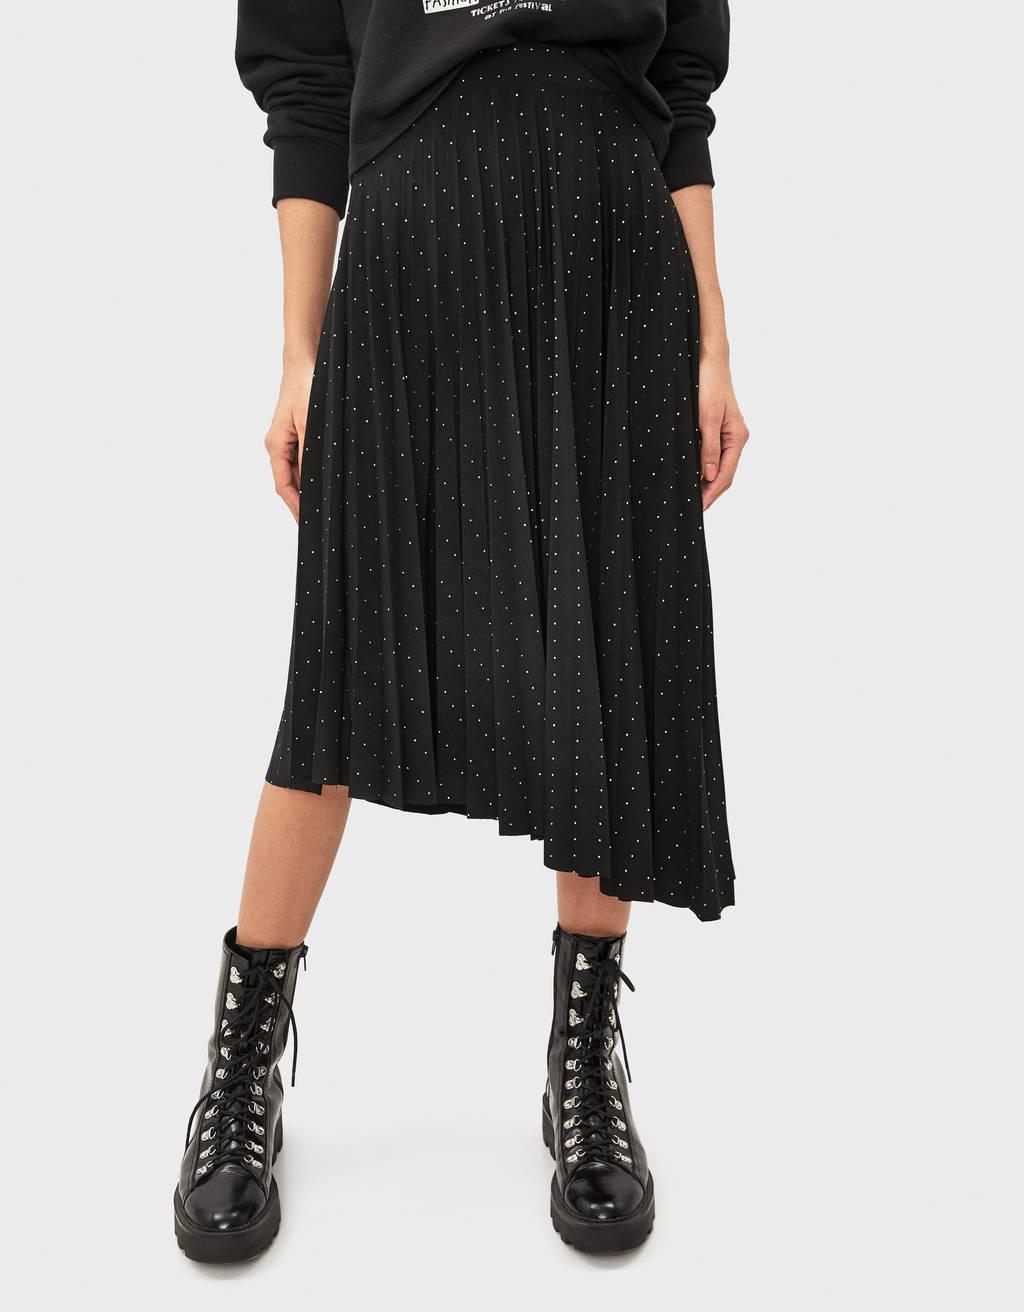 Asymmetric pleated skirt with polka dots